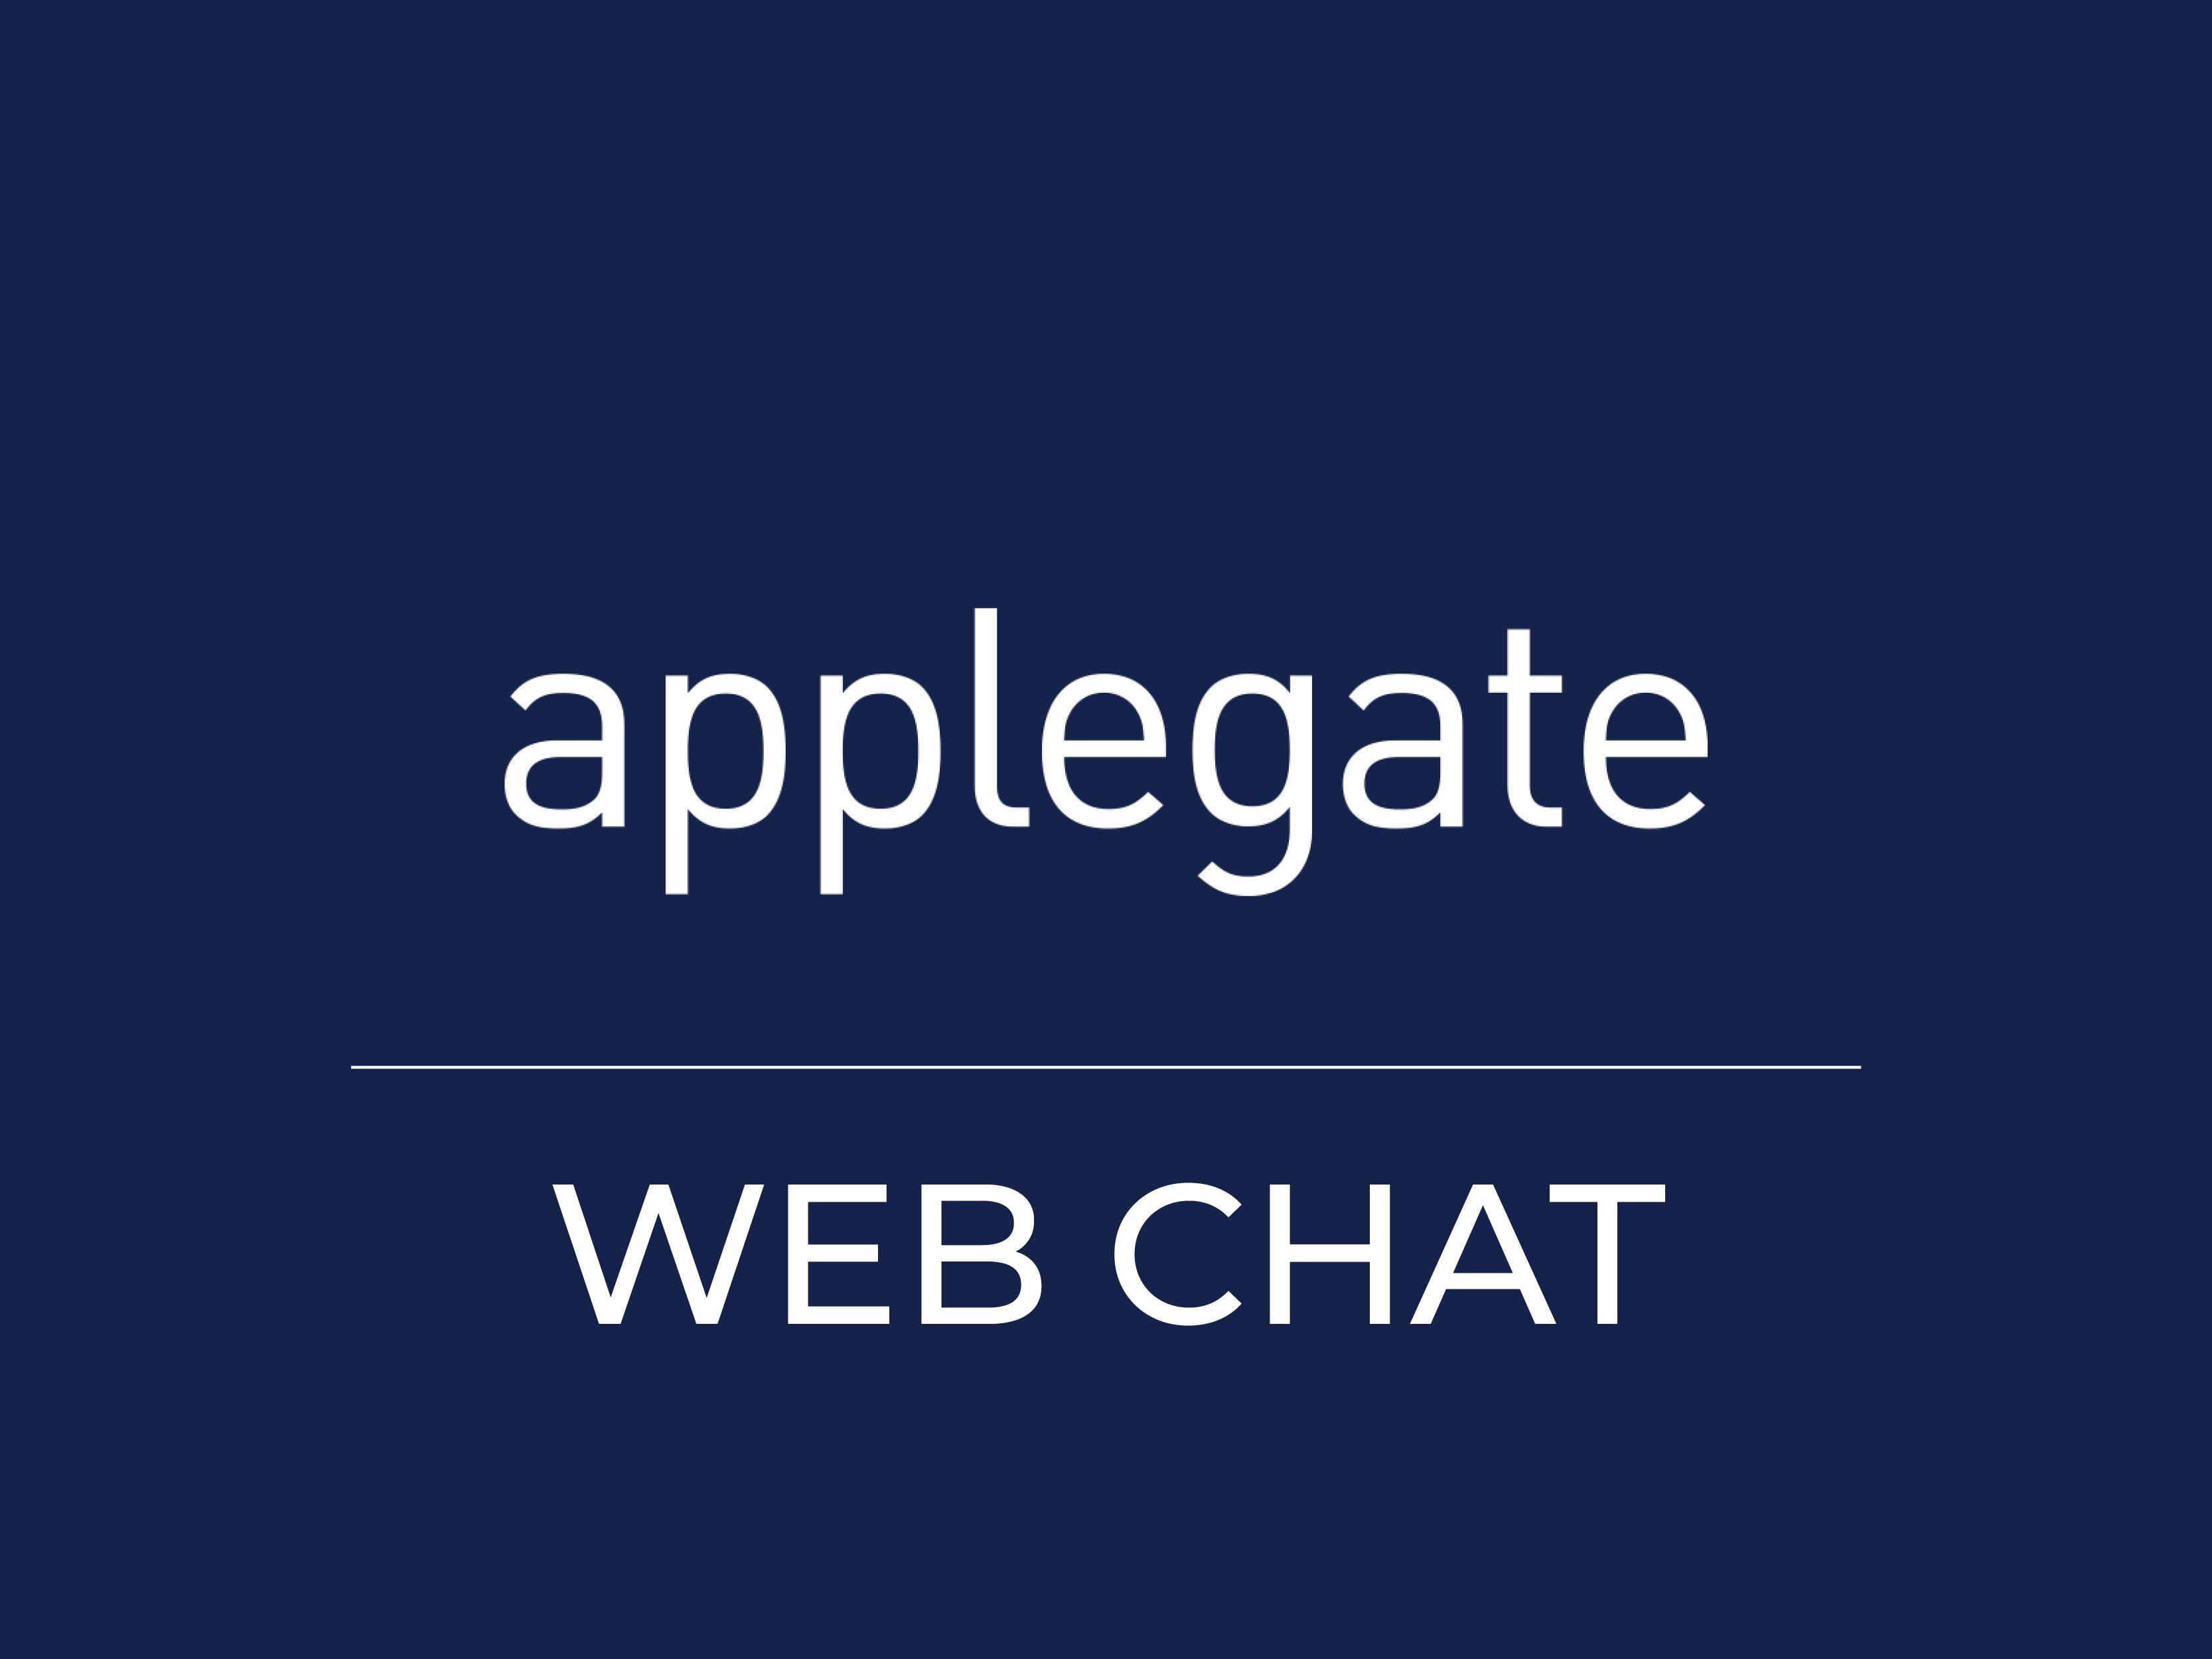 Applegate Web Chat